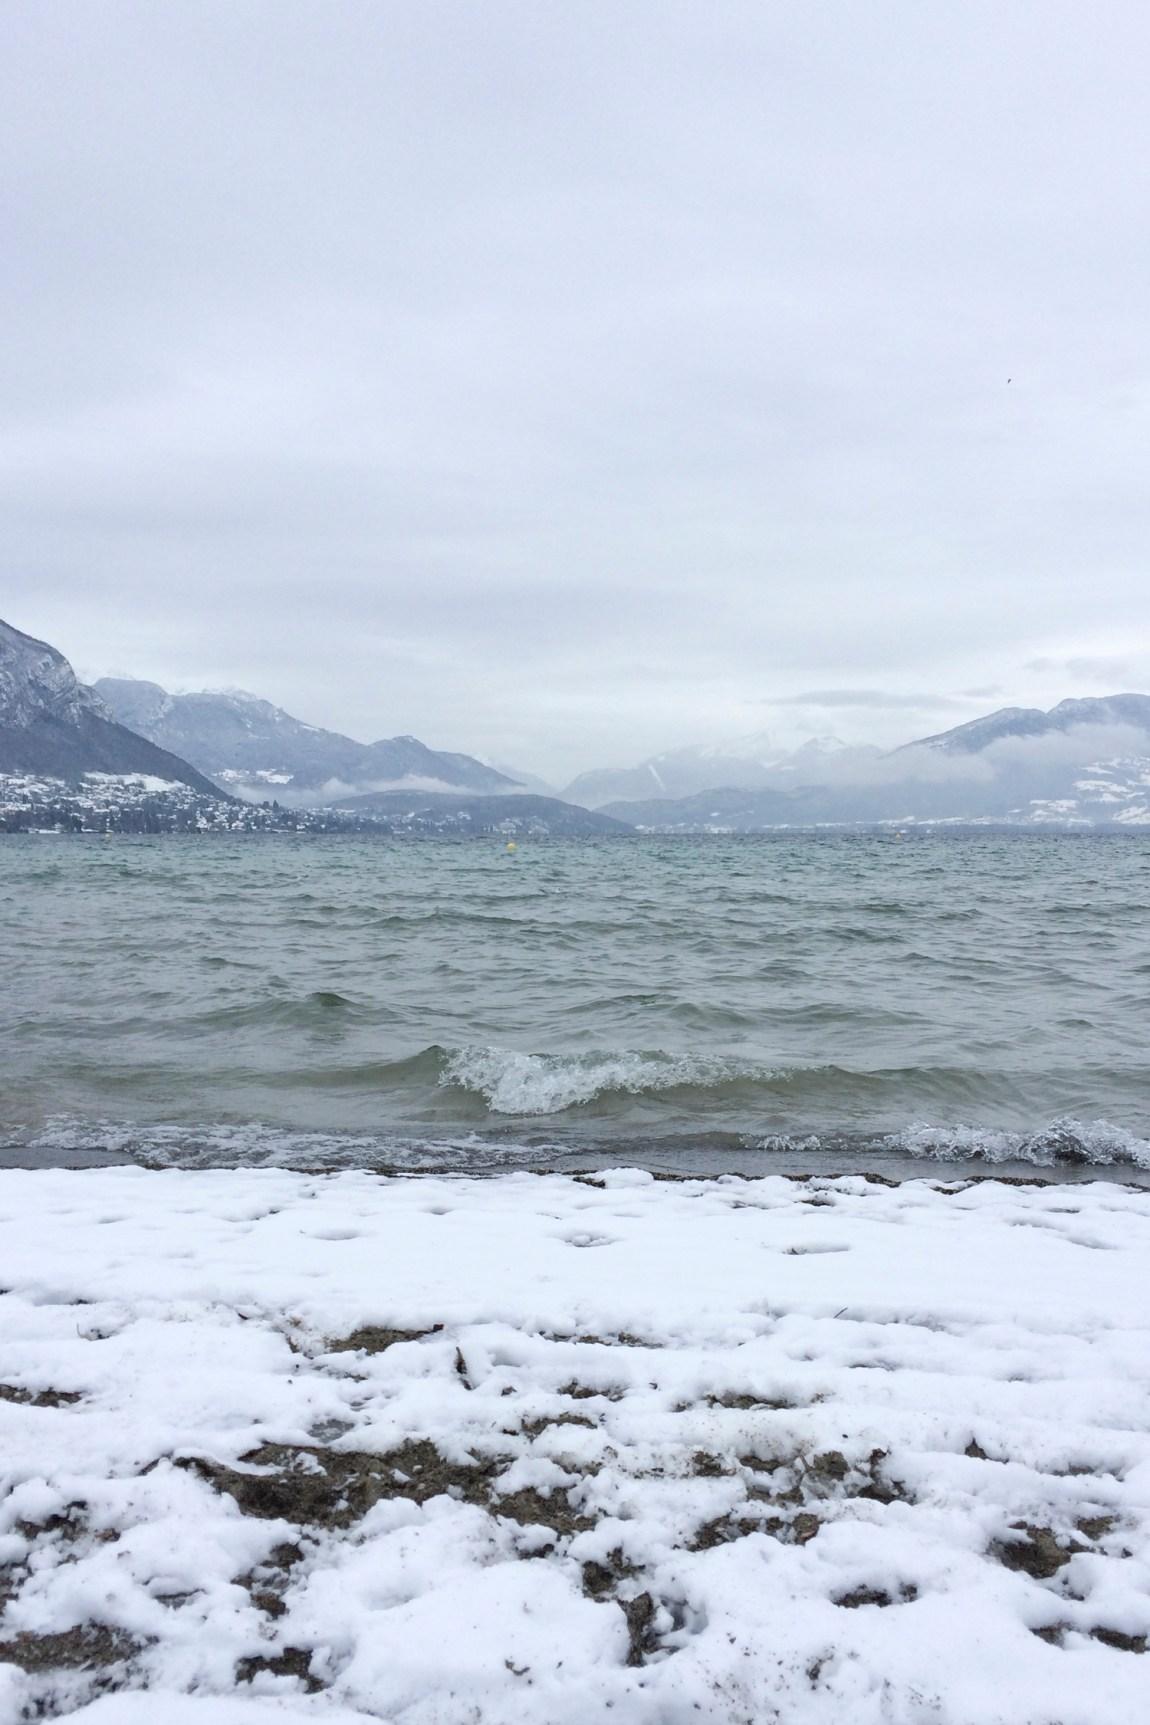 Annecy sous la neige hiver 2016 - www.paperboat.fr